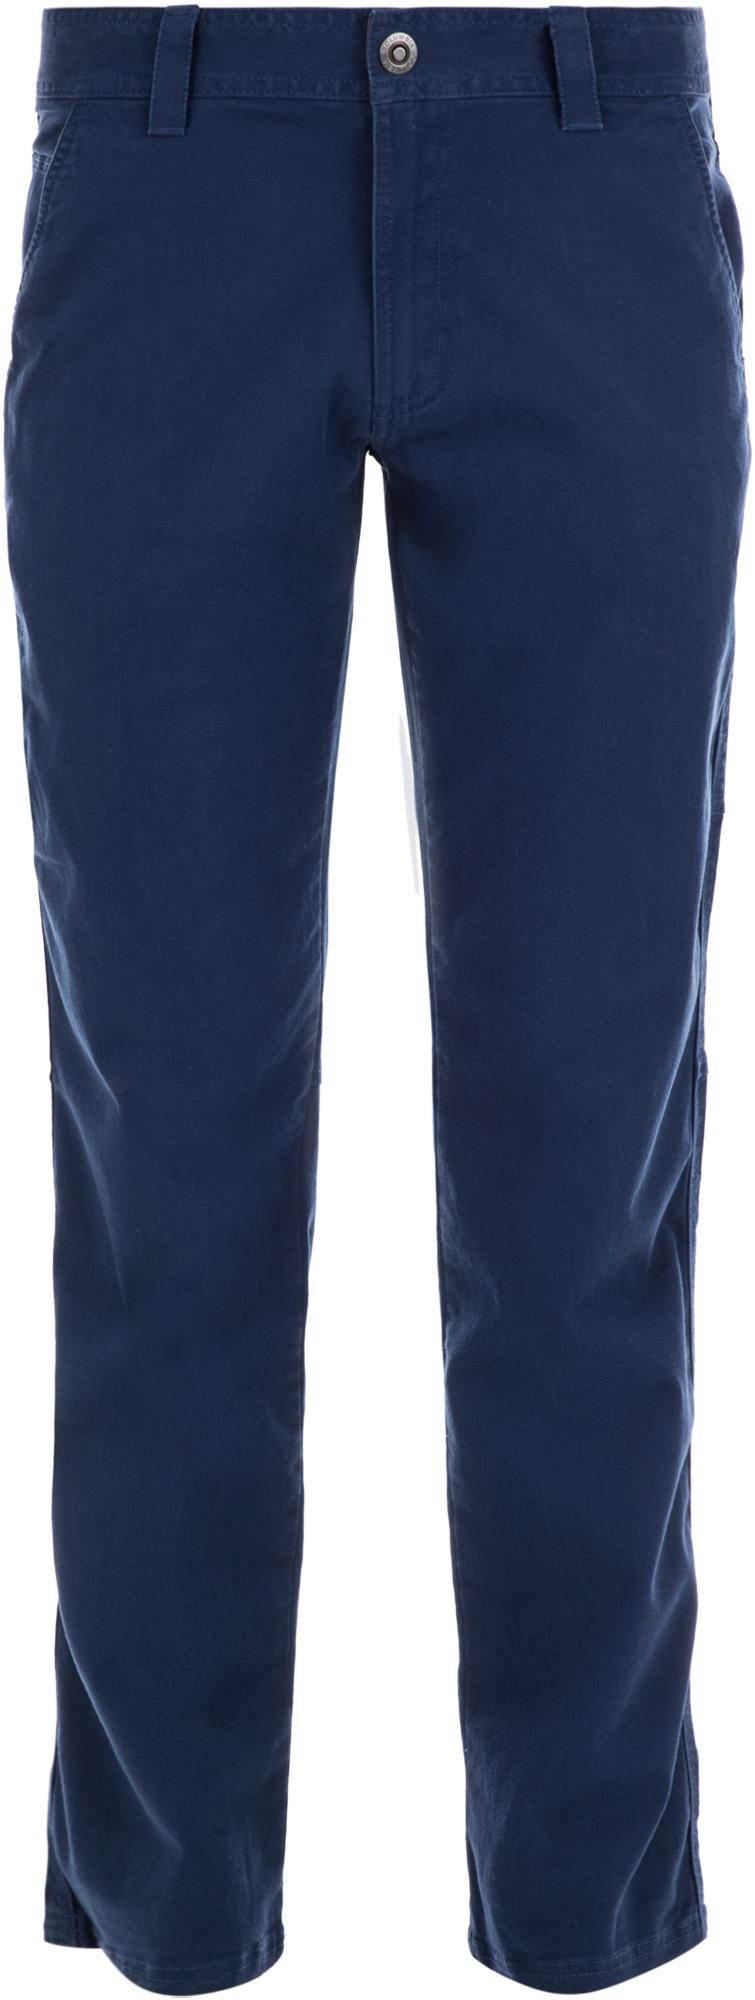 902020e4 Columbia Брюки мужские Columbia Ultimate Roc, размер 60-32 брюки мужские  columbia washed out